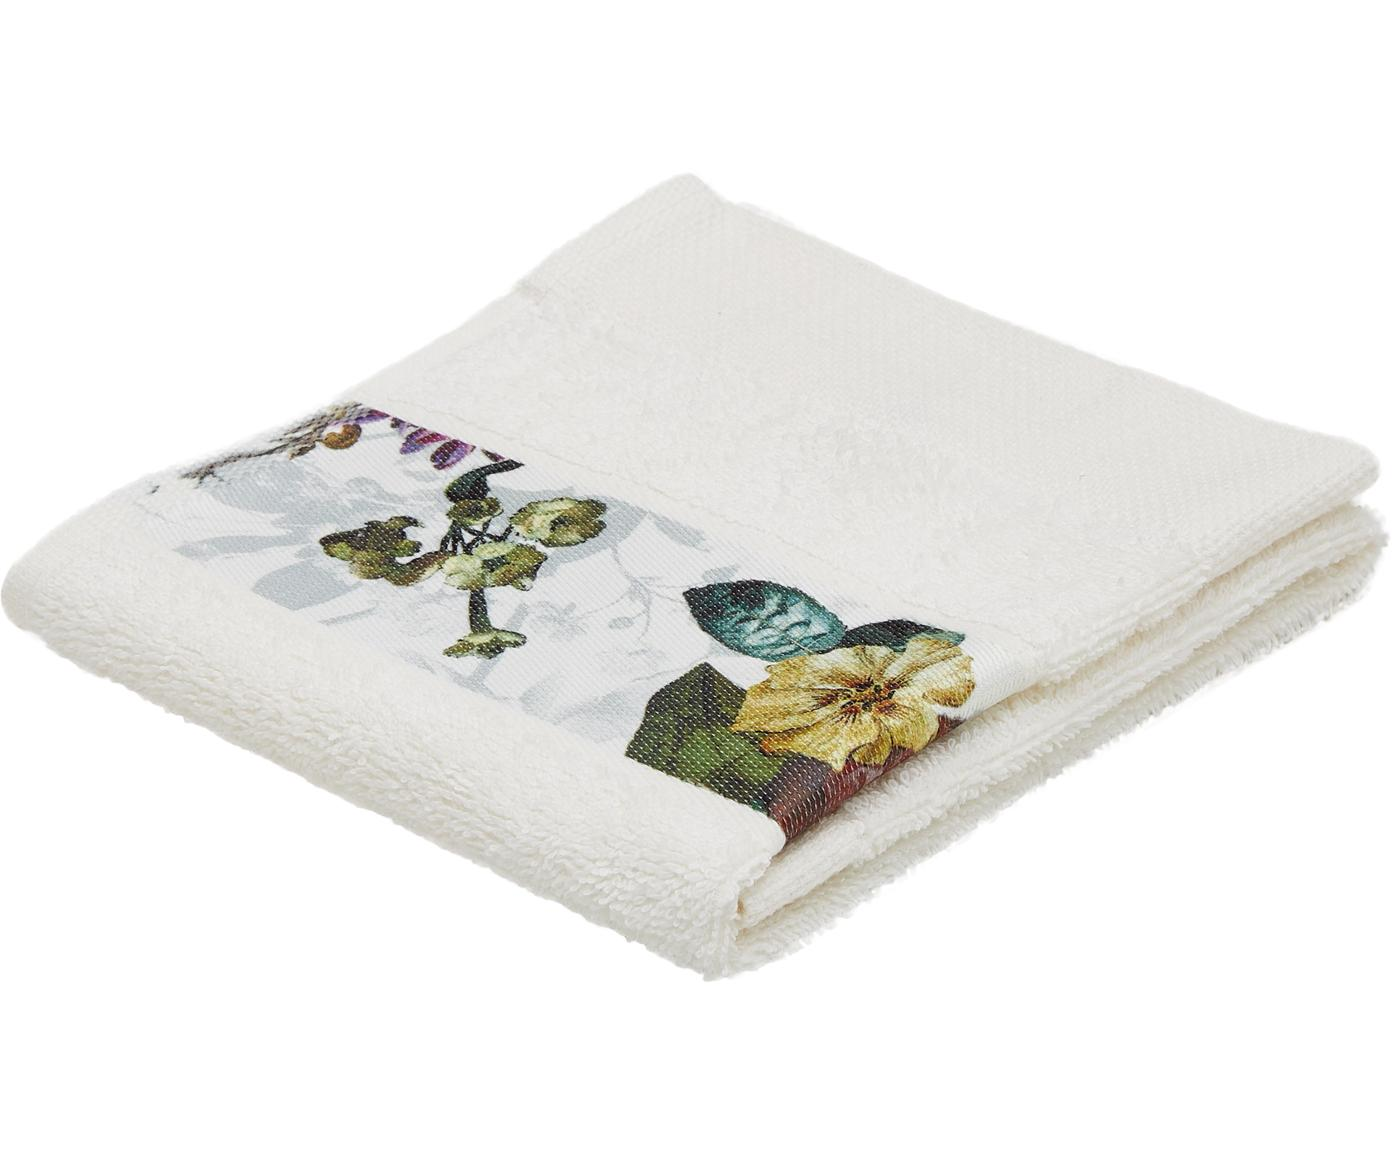 Handdoek Fleur met bloemenrand, 97% katoen 3% polyester, Crèmewit, multicolour, Gastendoekje